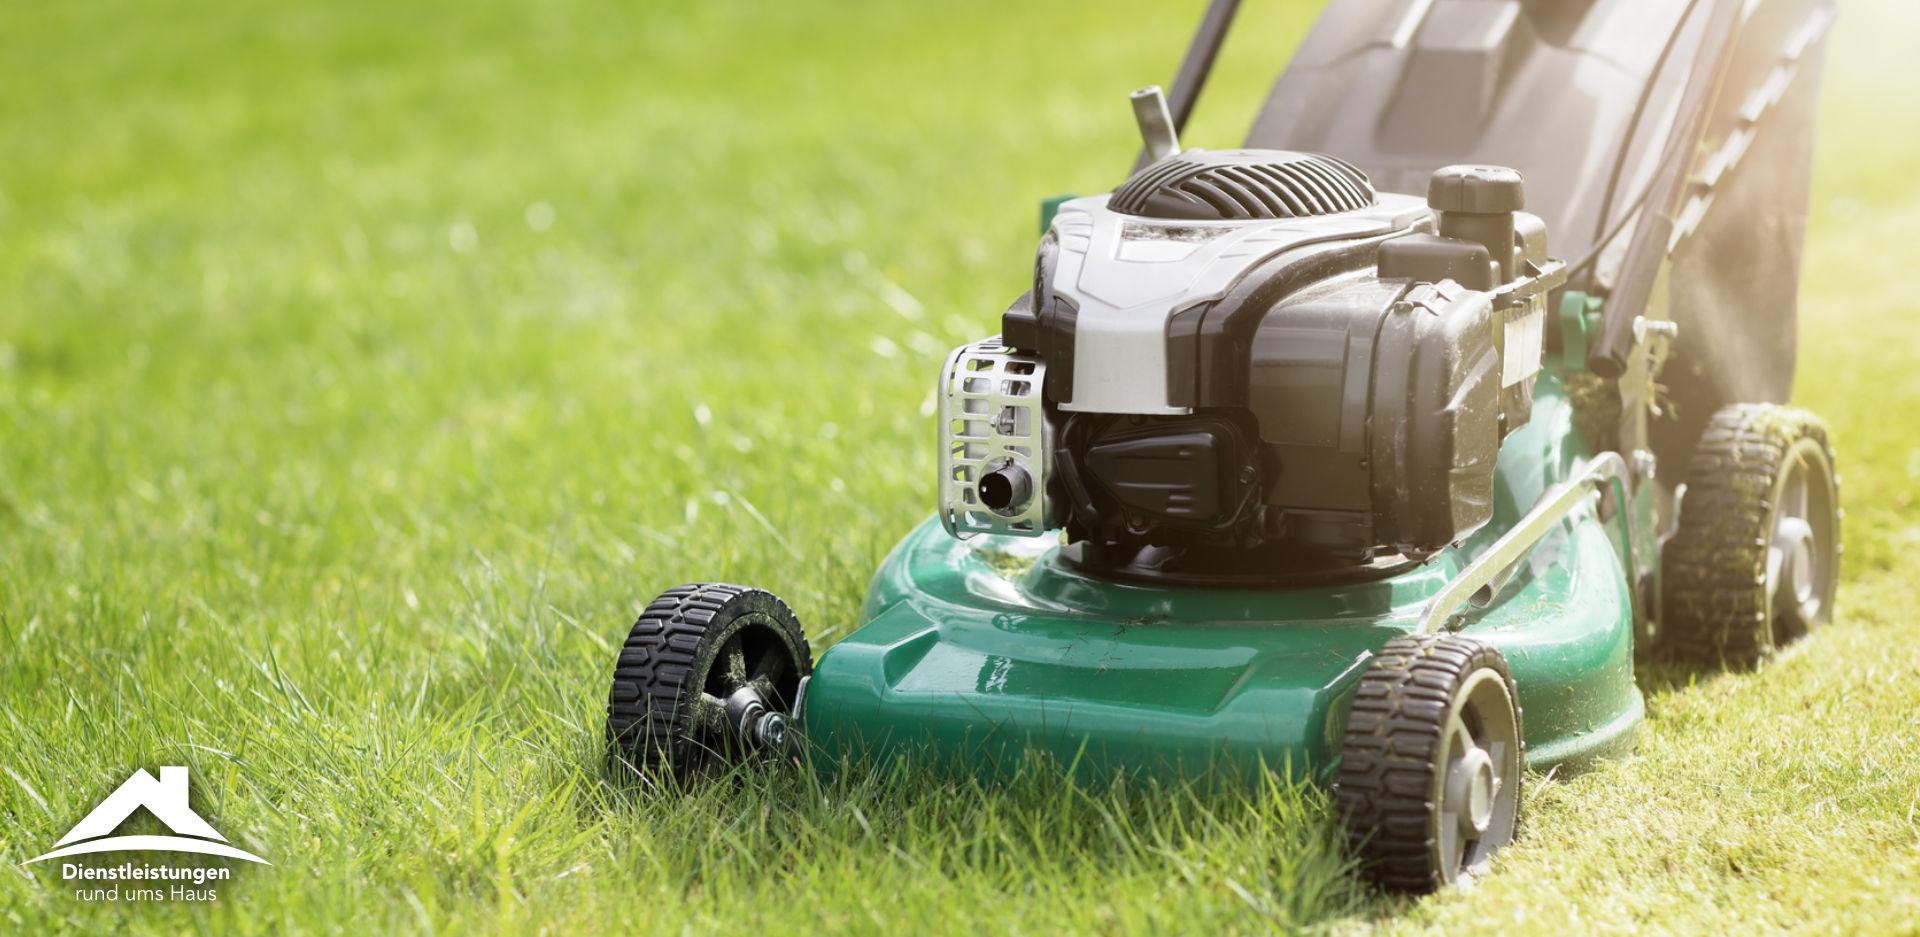 Grundstückpflege